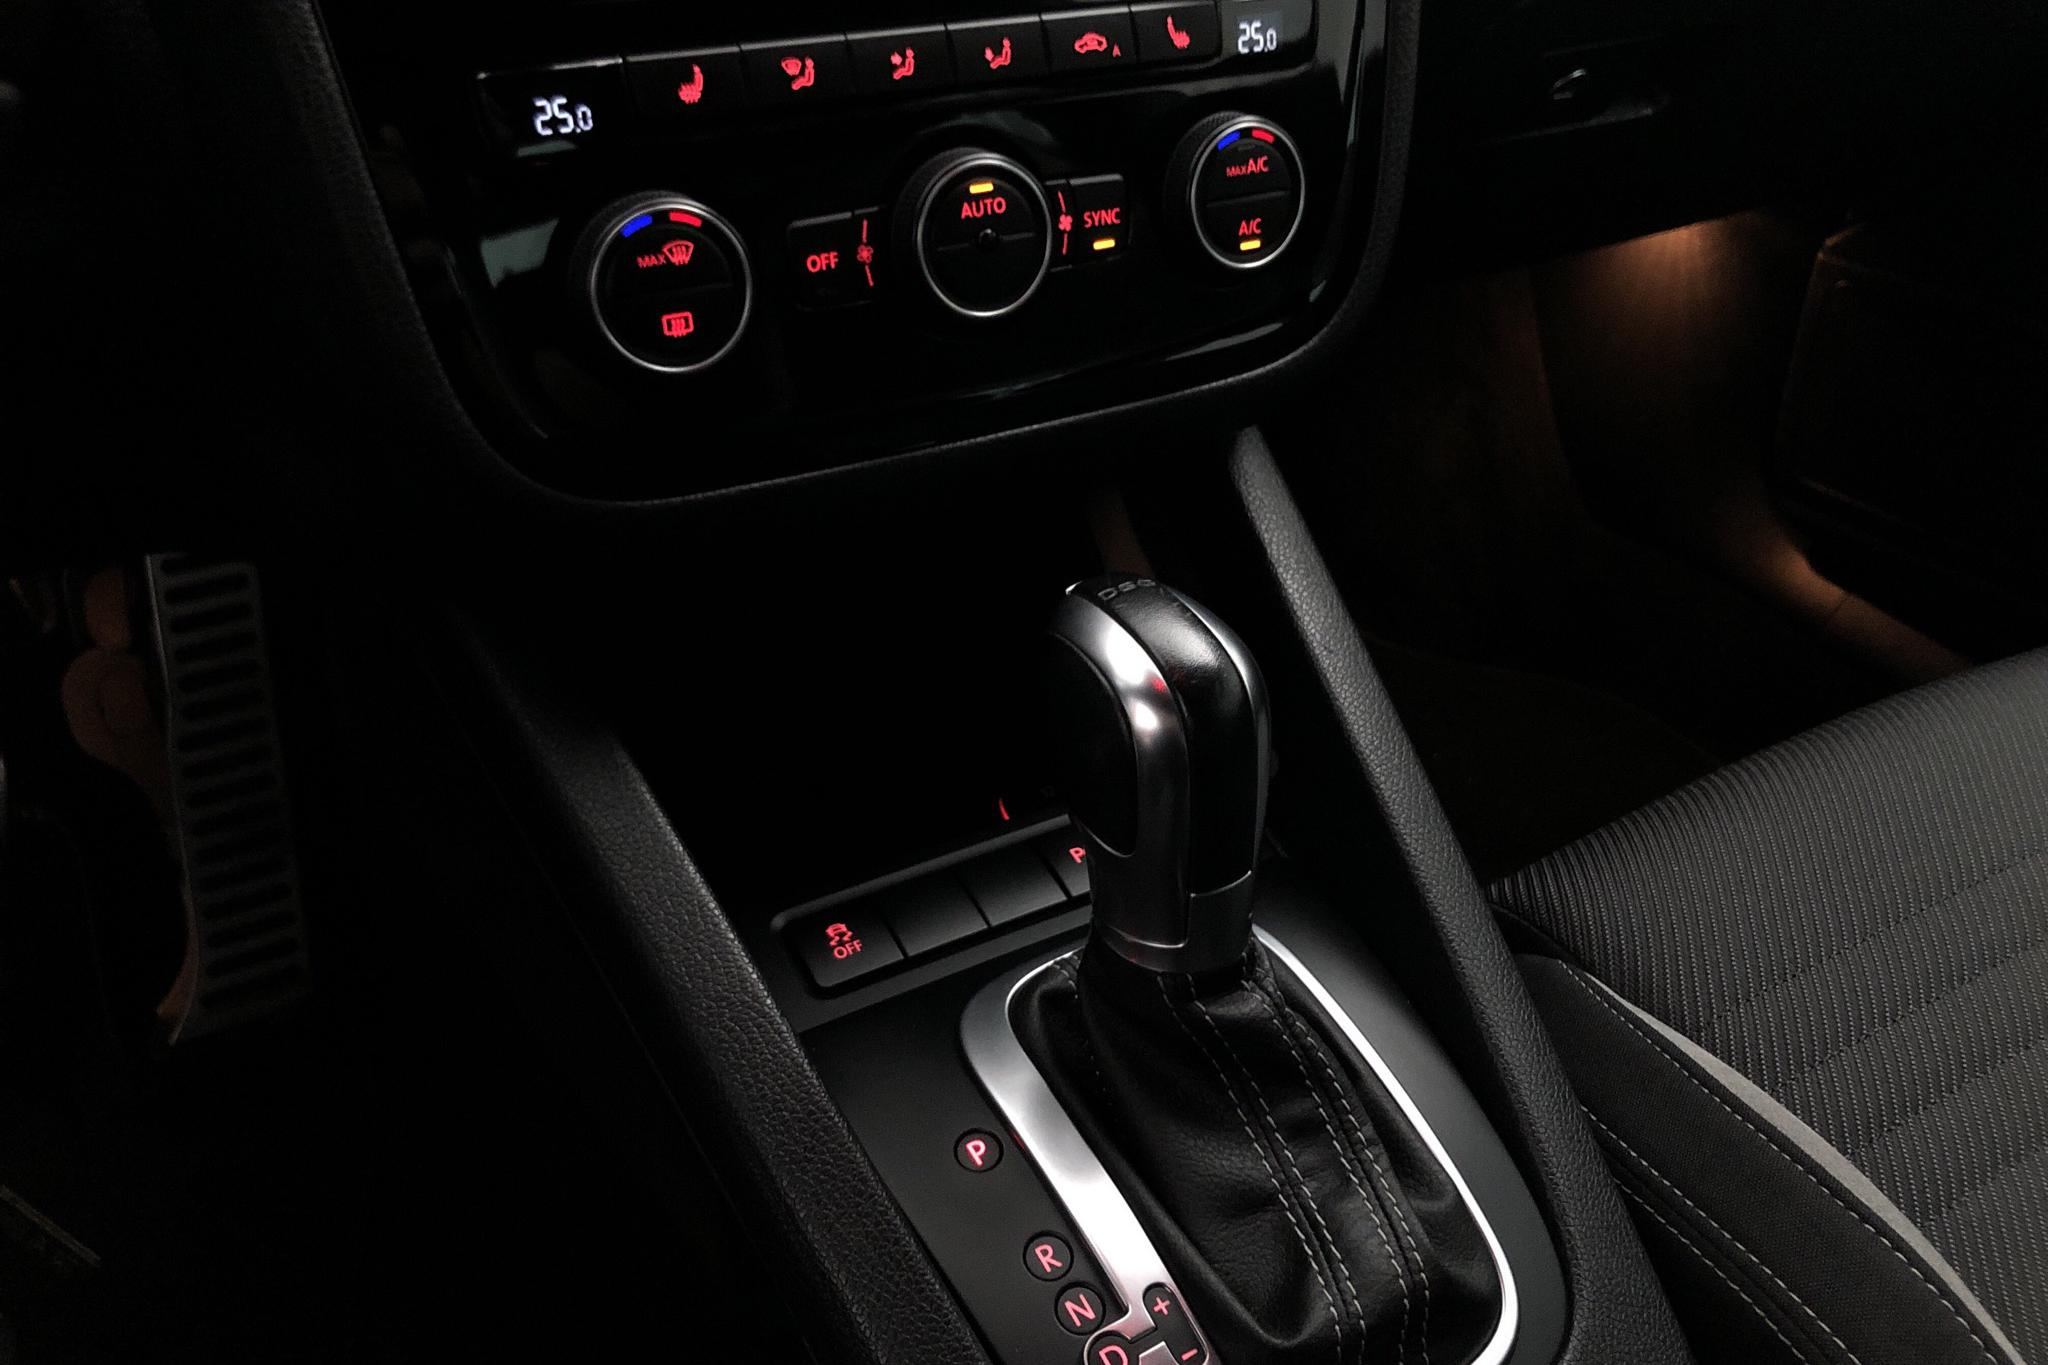 VW Scirocco R (280hk) - 7 354 mil - Automat - svart - 2016